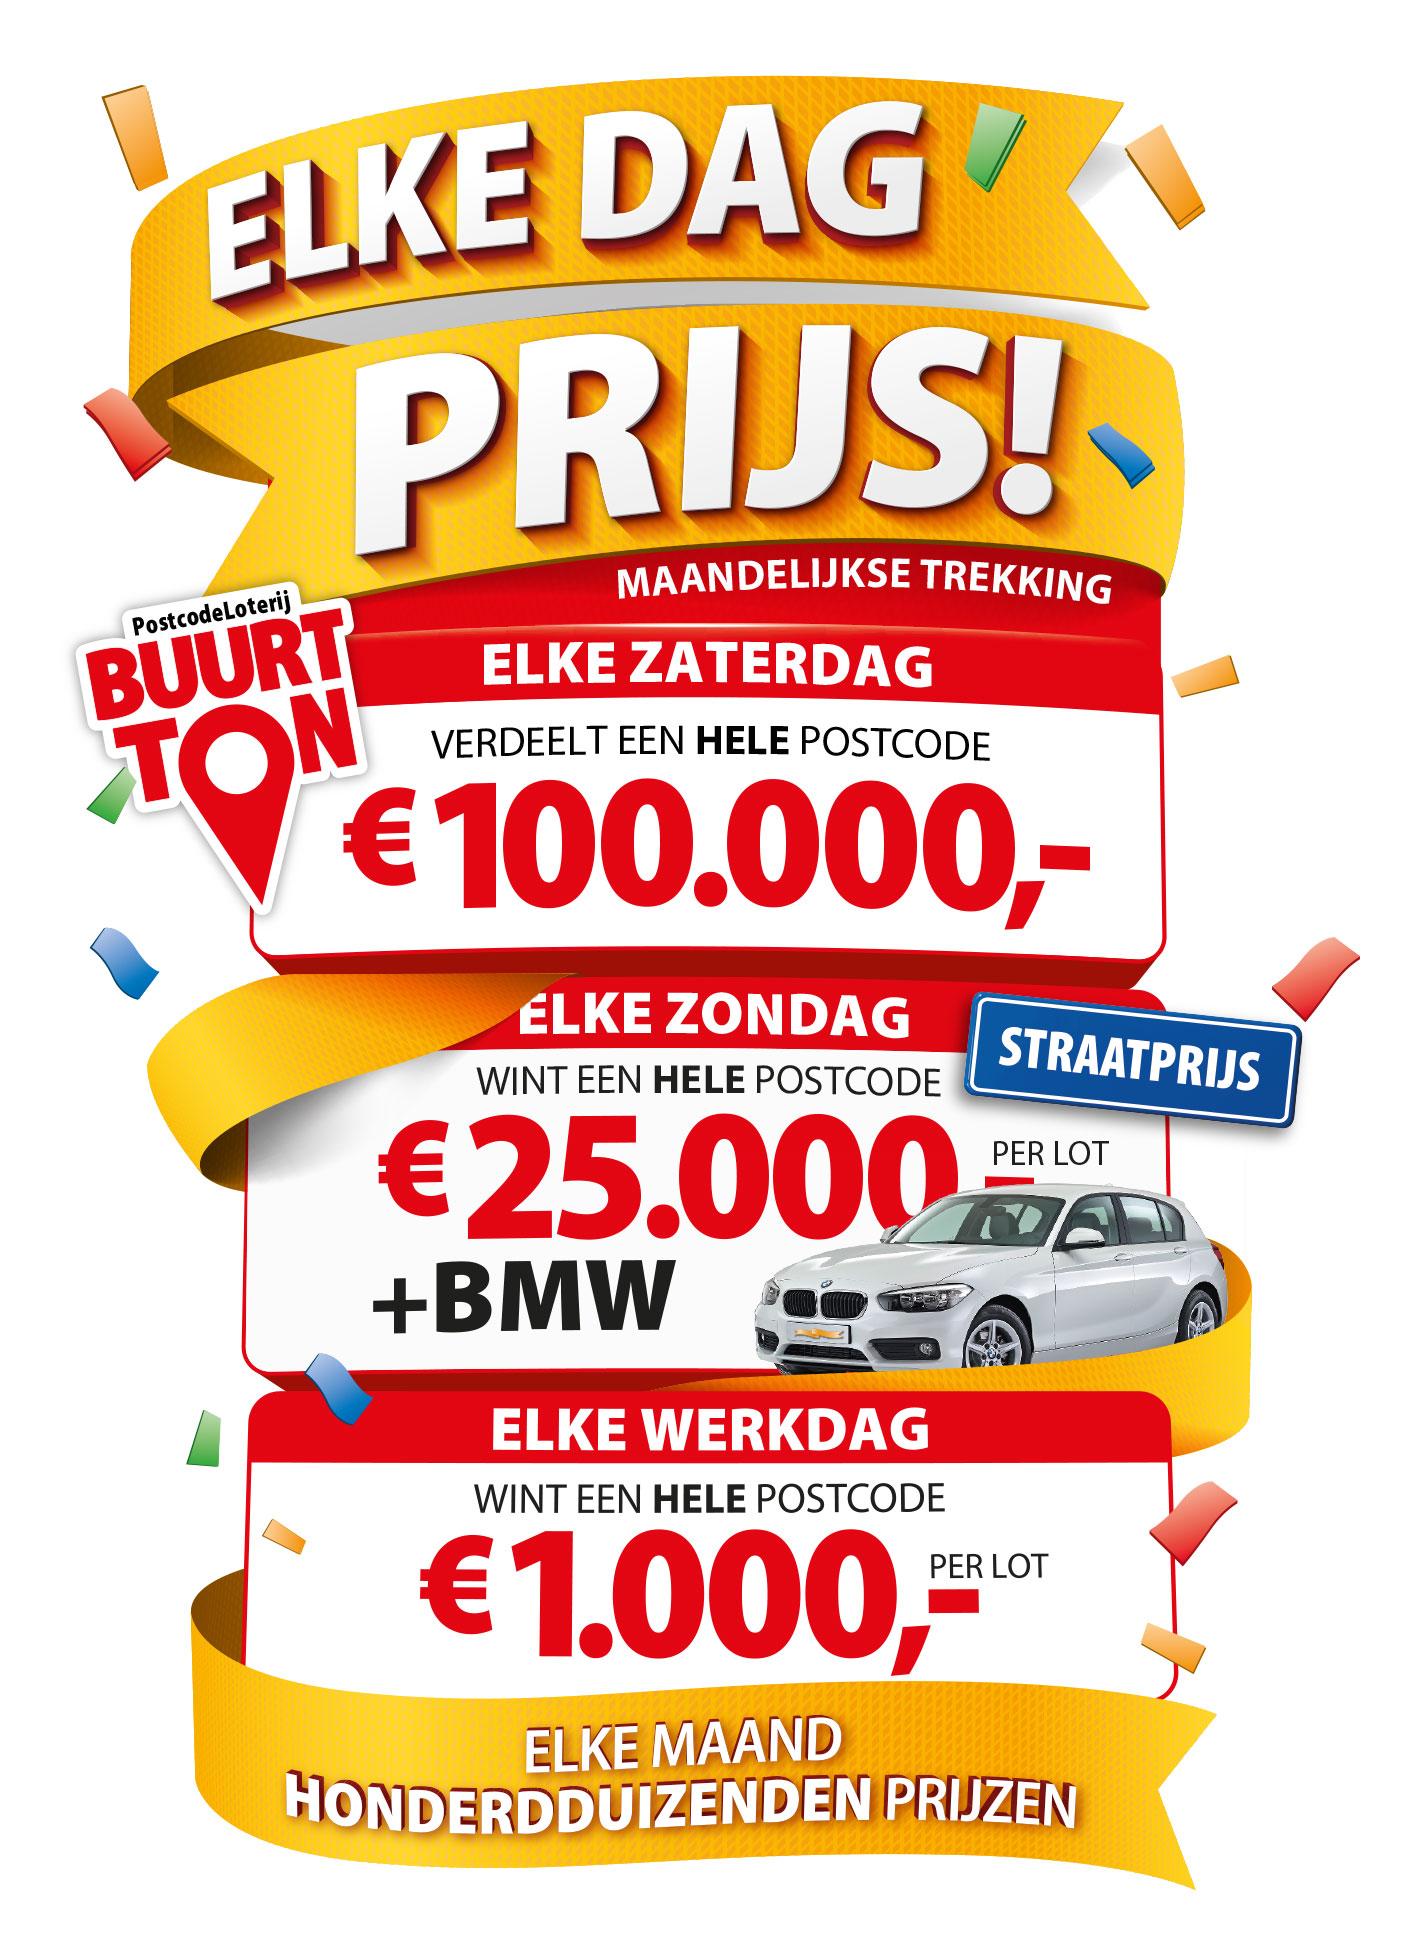 Postcode Loterij Miljoenenjacht In September 5x Kans Op